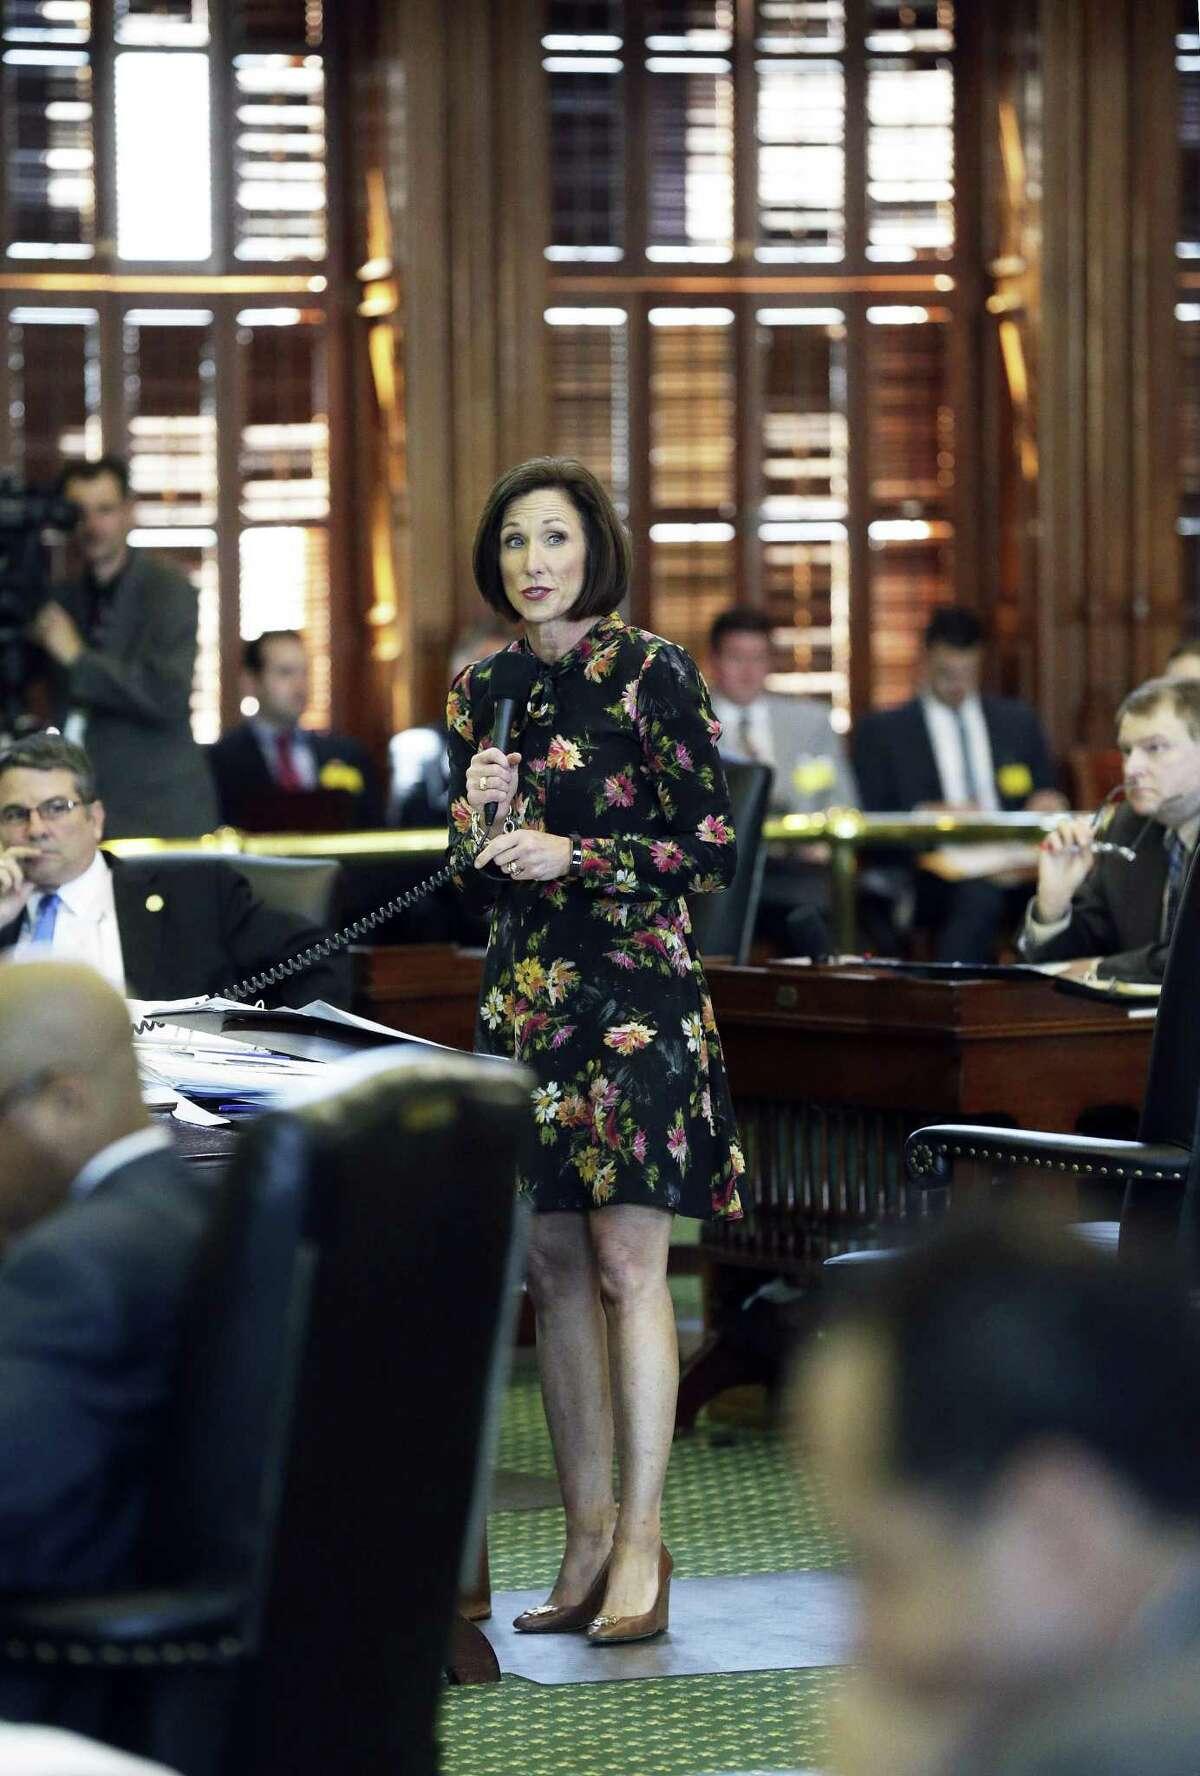 Senator Lois Kolkhorst introduces her legislation, the so called bathroom bill, on the floor of the Senate on March 14, 2017.